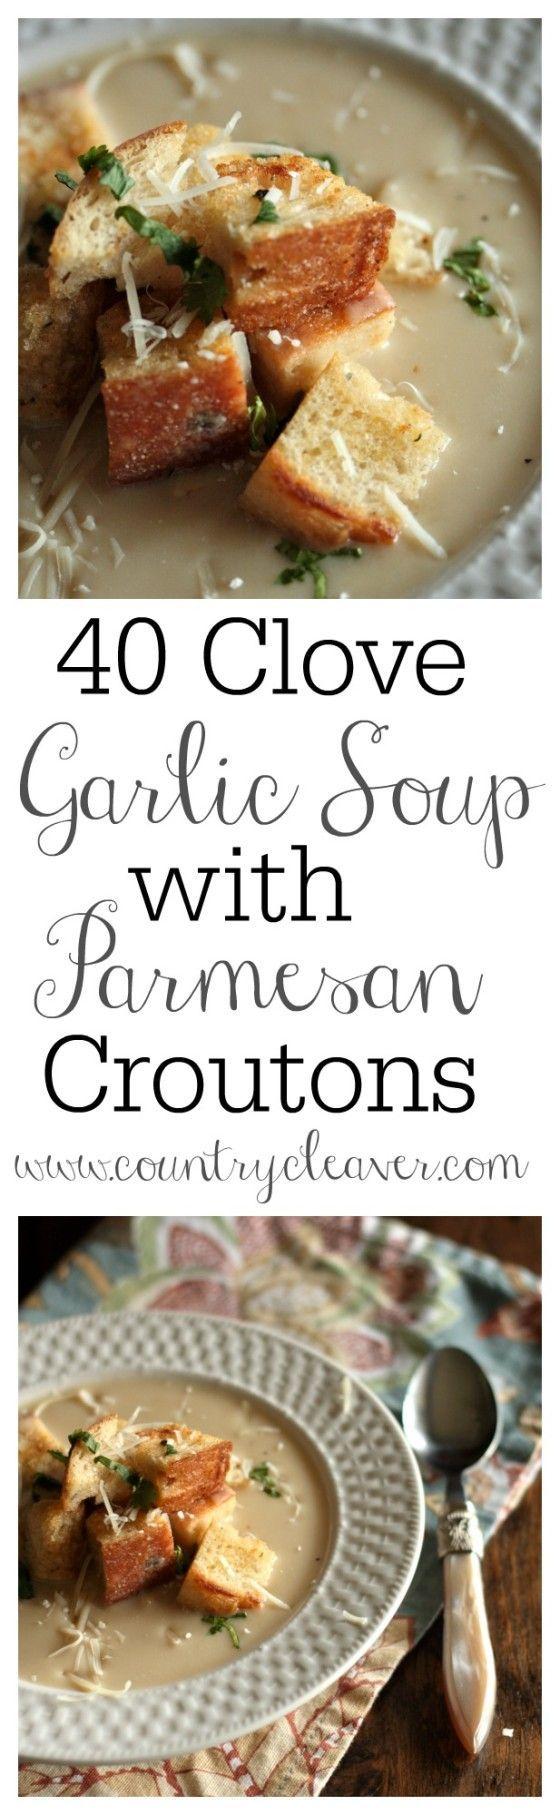 40 Clove Garlic Soup with Parmesan Croutons: